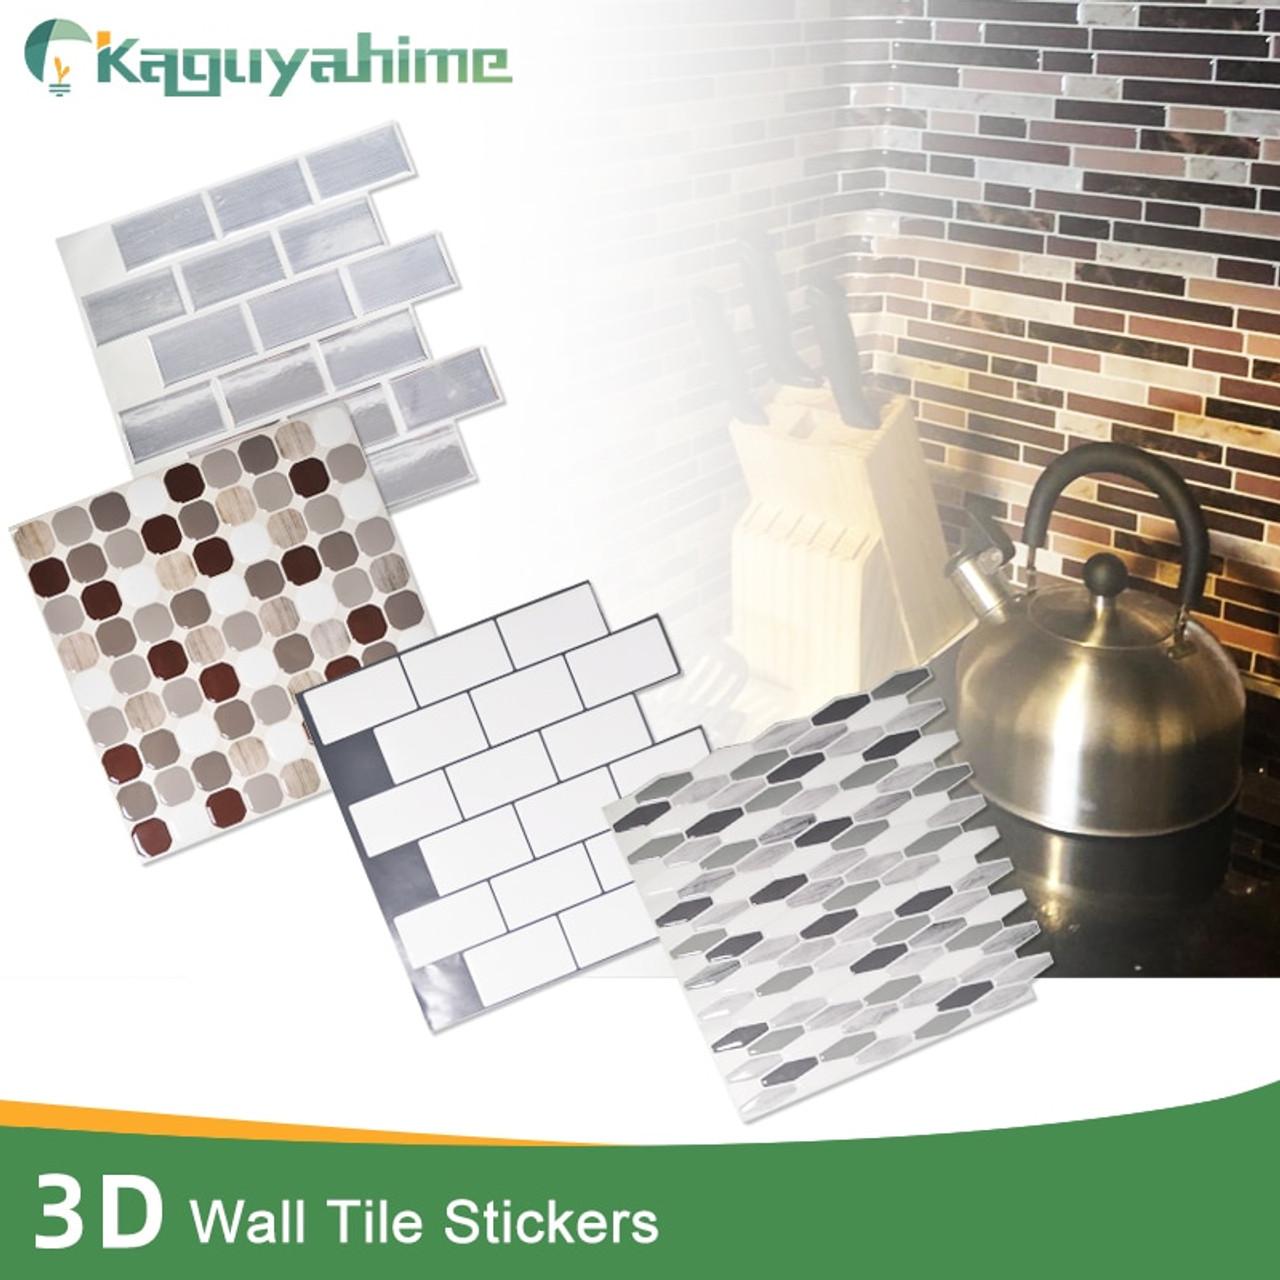 kaguyahime 10pcs self adhesive mosaic tiles diy 3d wall stickers ceramic tile imitation ceramic crystal waterproof wallpaper